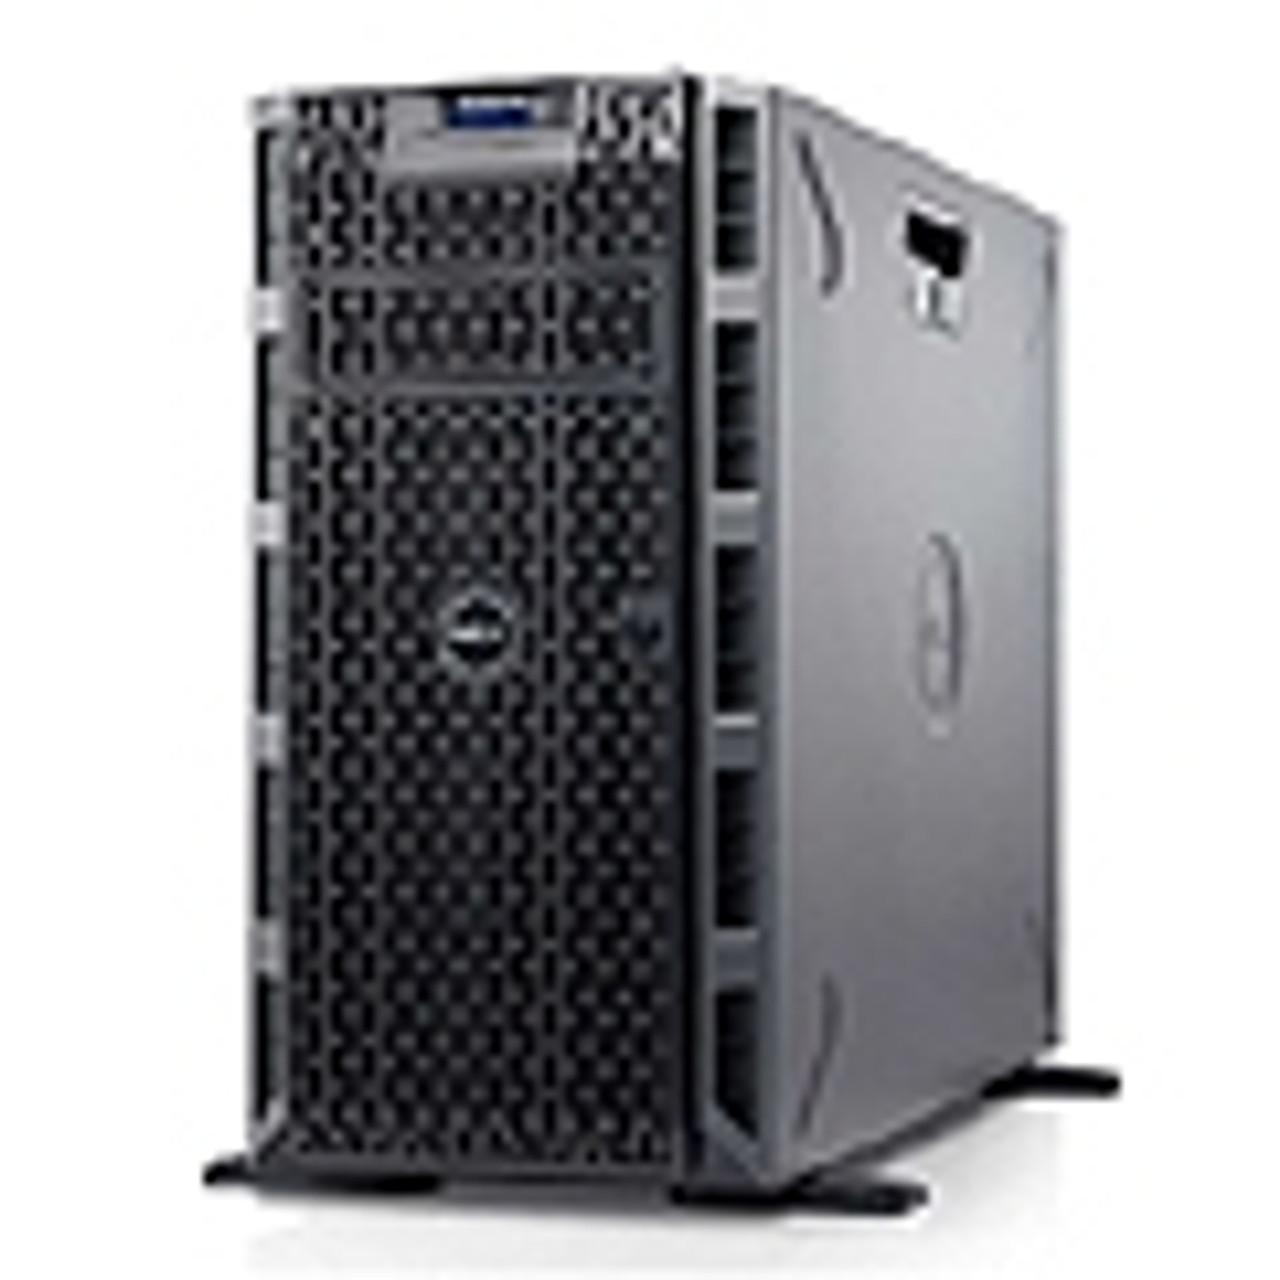 Dell PowerEdge T620 Servers